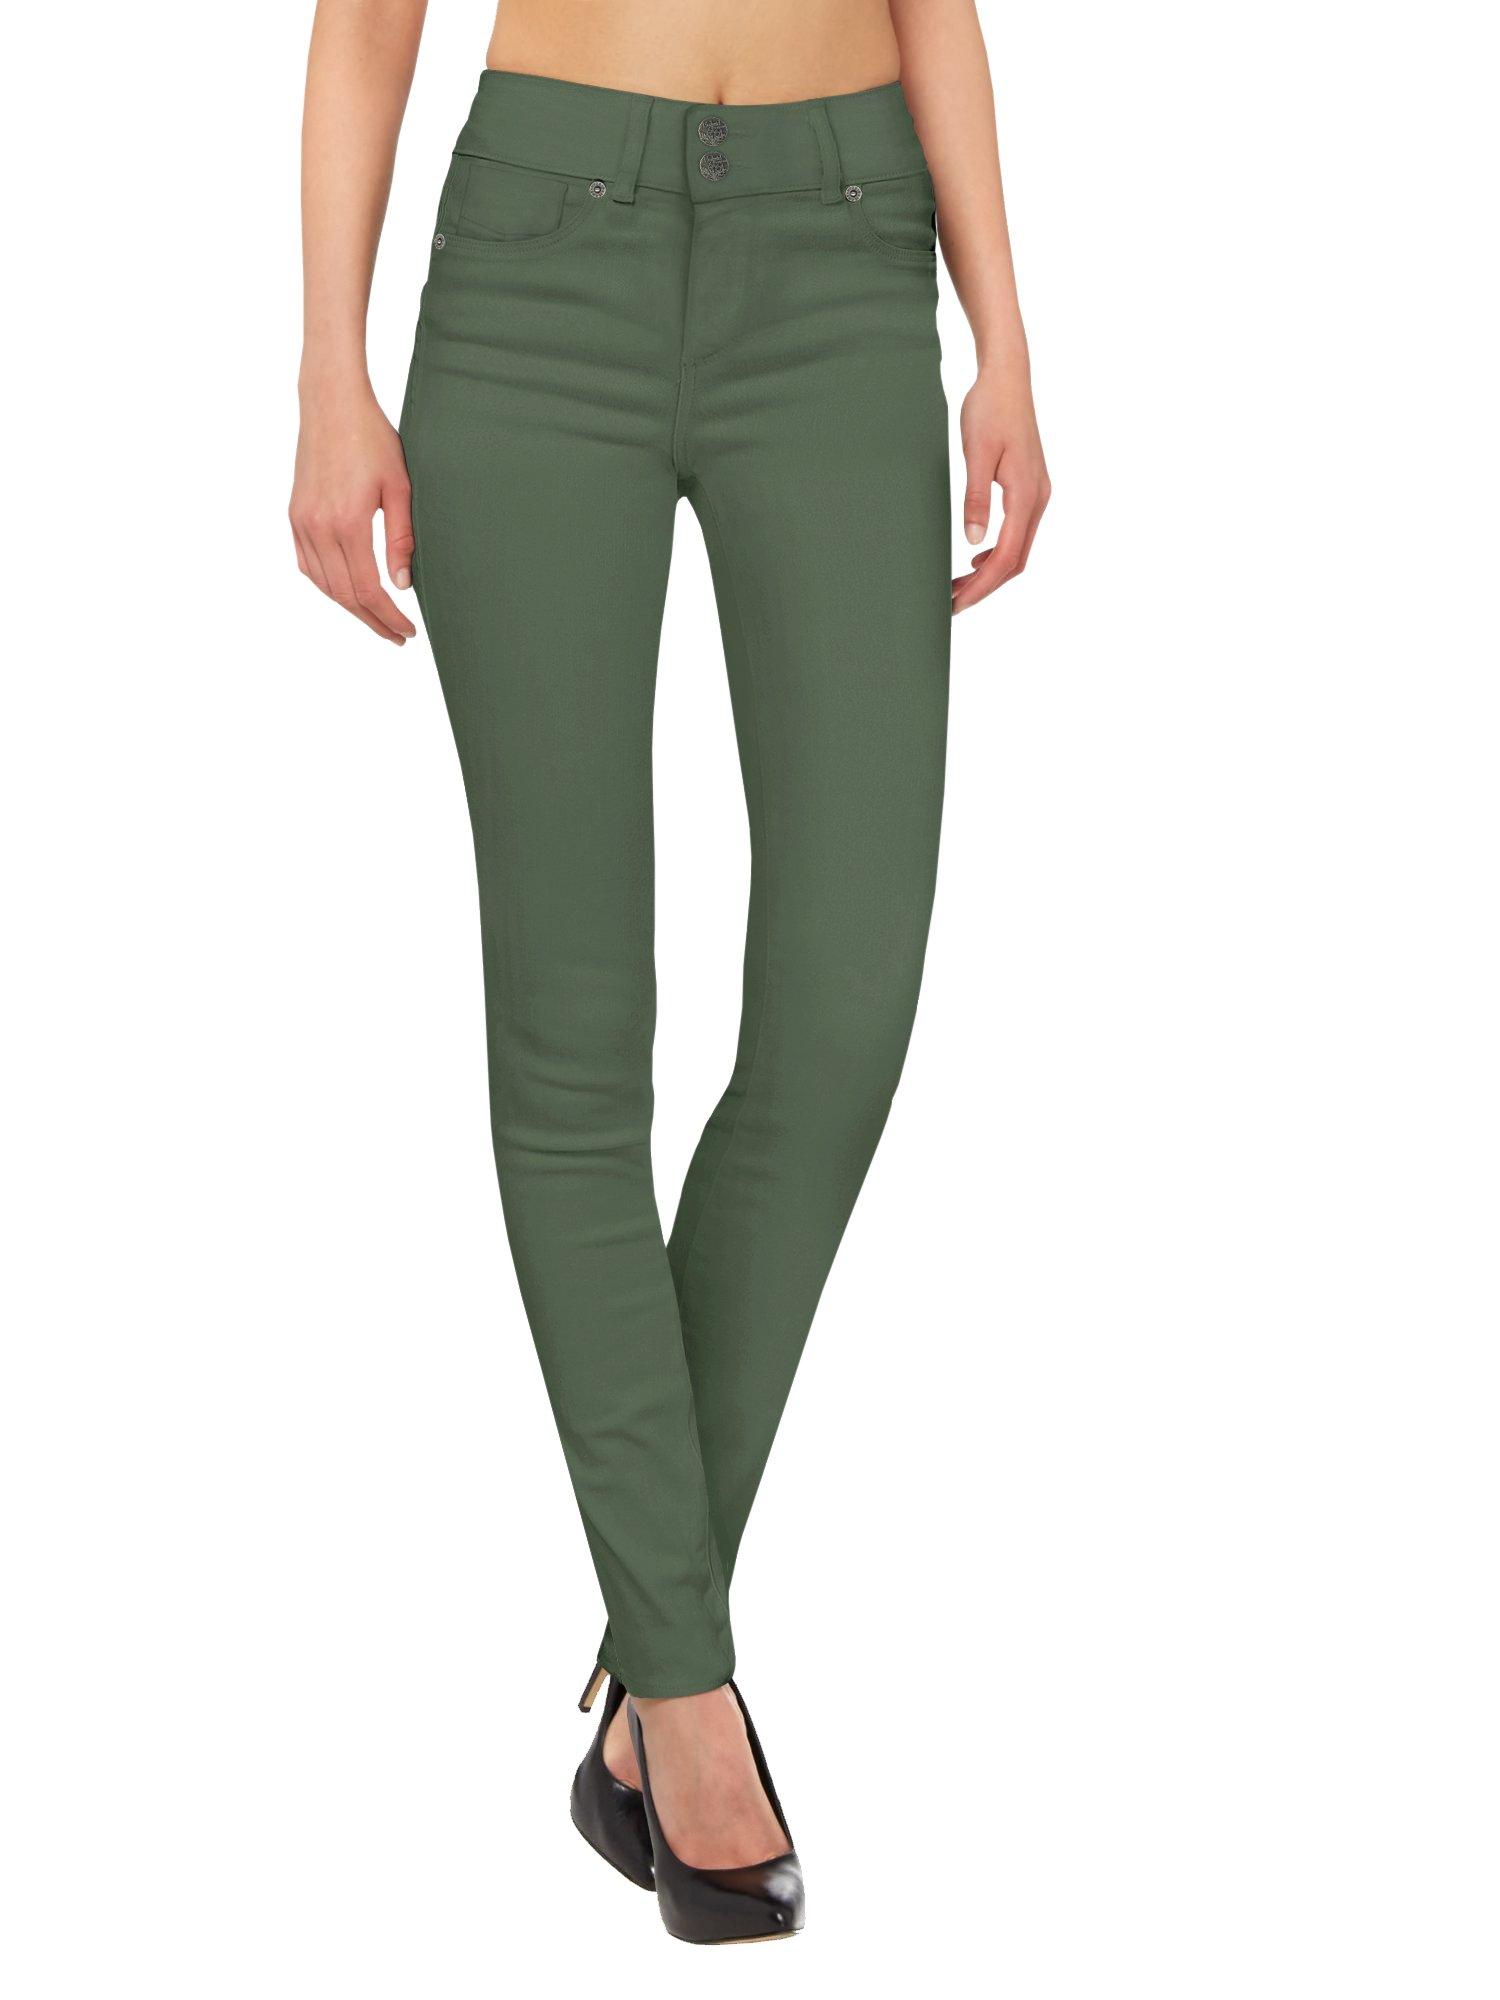 HyBrid & Company Women's Butt Lift V2 Super Comfy Stretch Denim Jeans P43637SK Olive 13 by HyBrid & Company (Image #2)